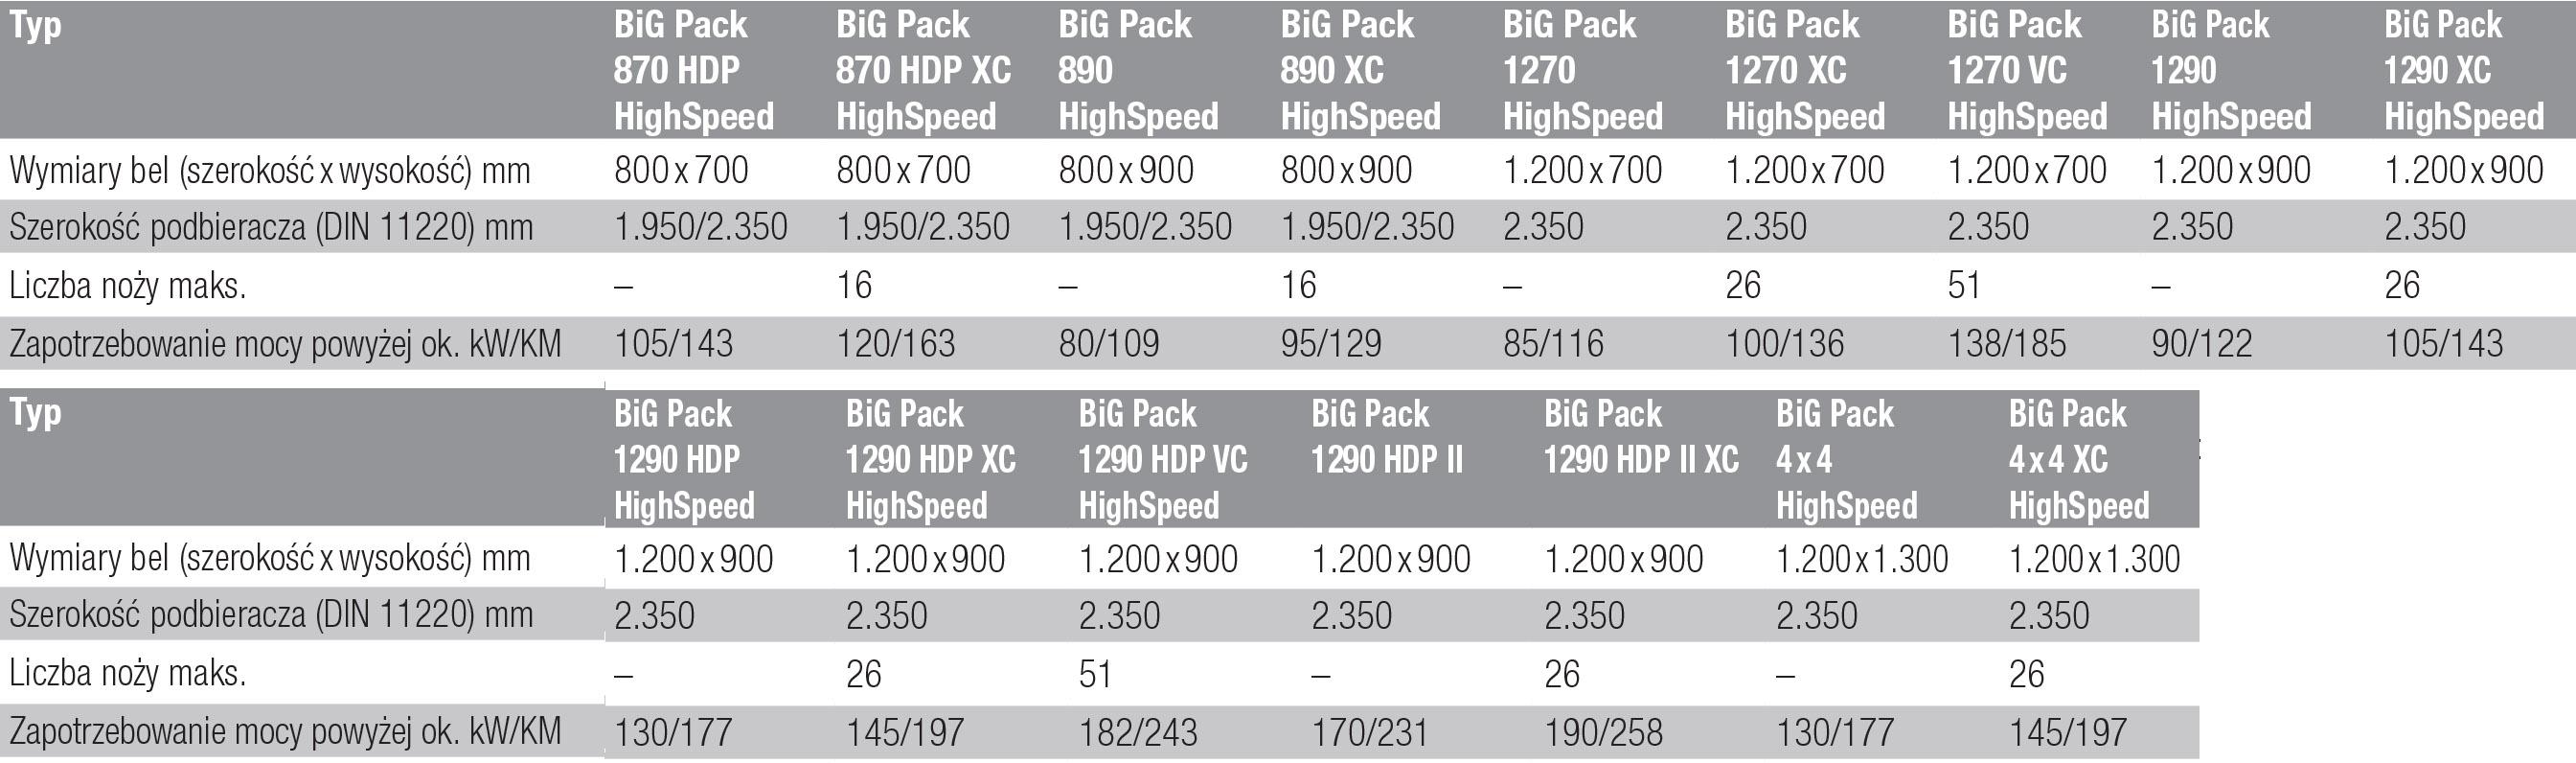 bigpack05